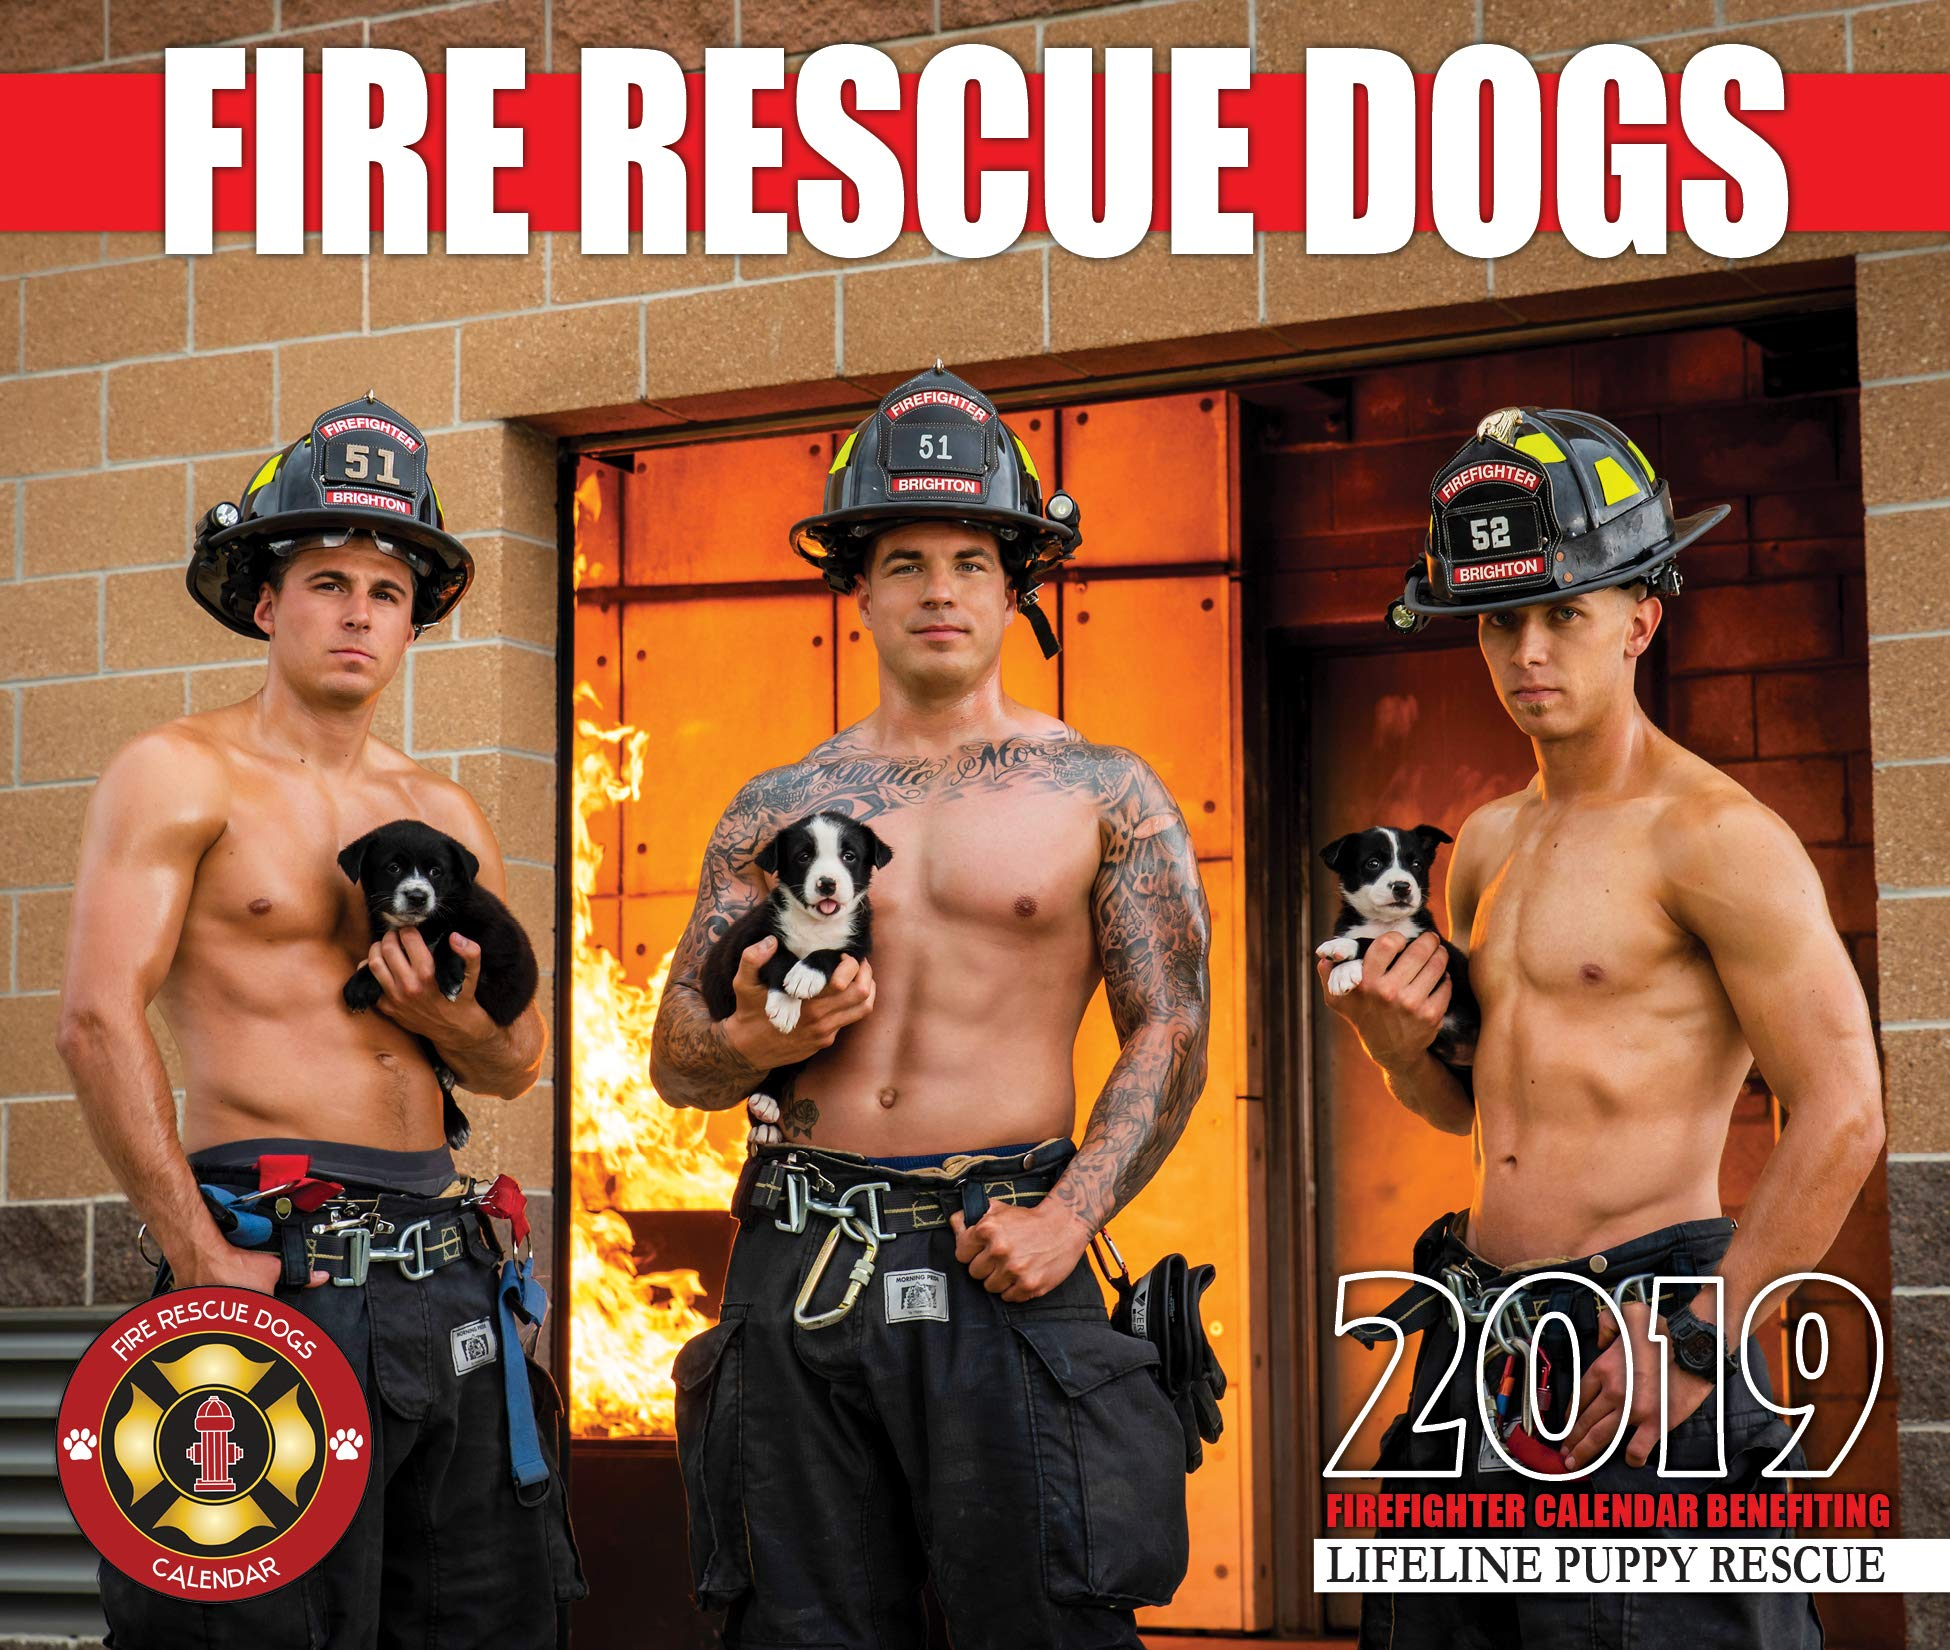 2019 Fire Rescue Dogs Calendar